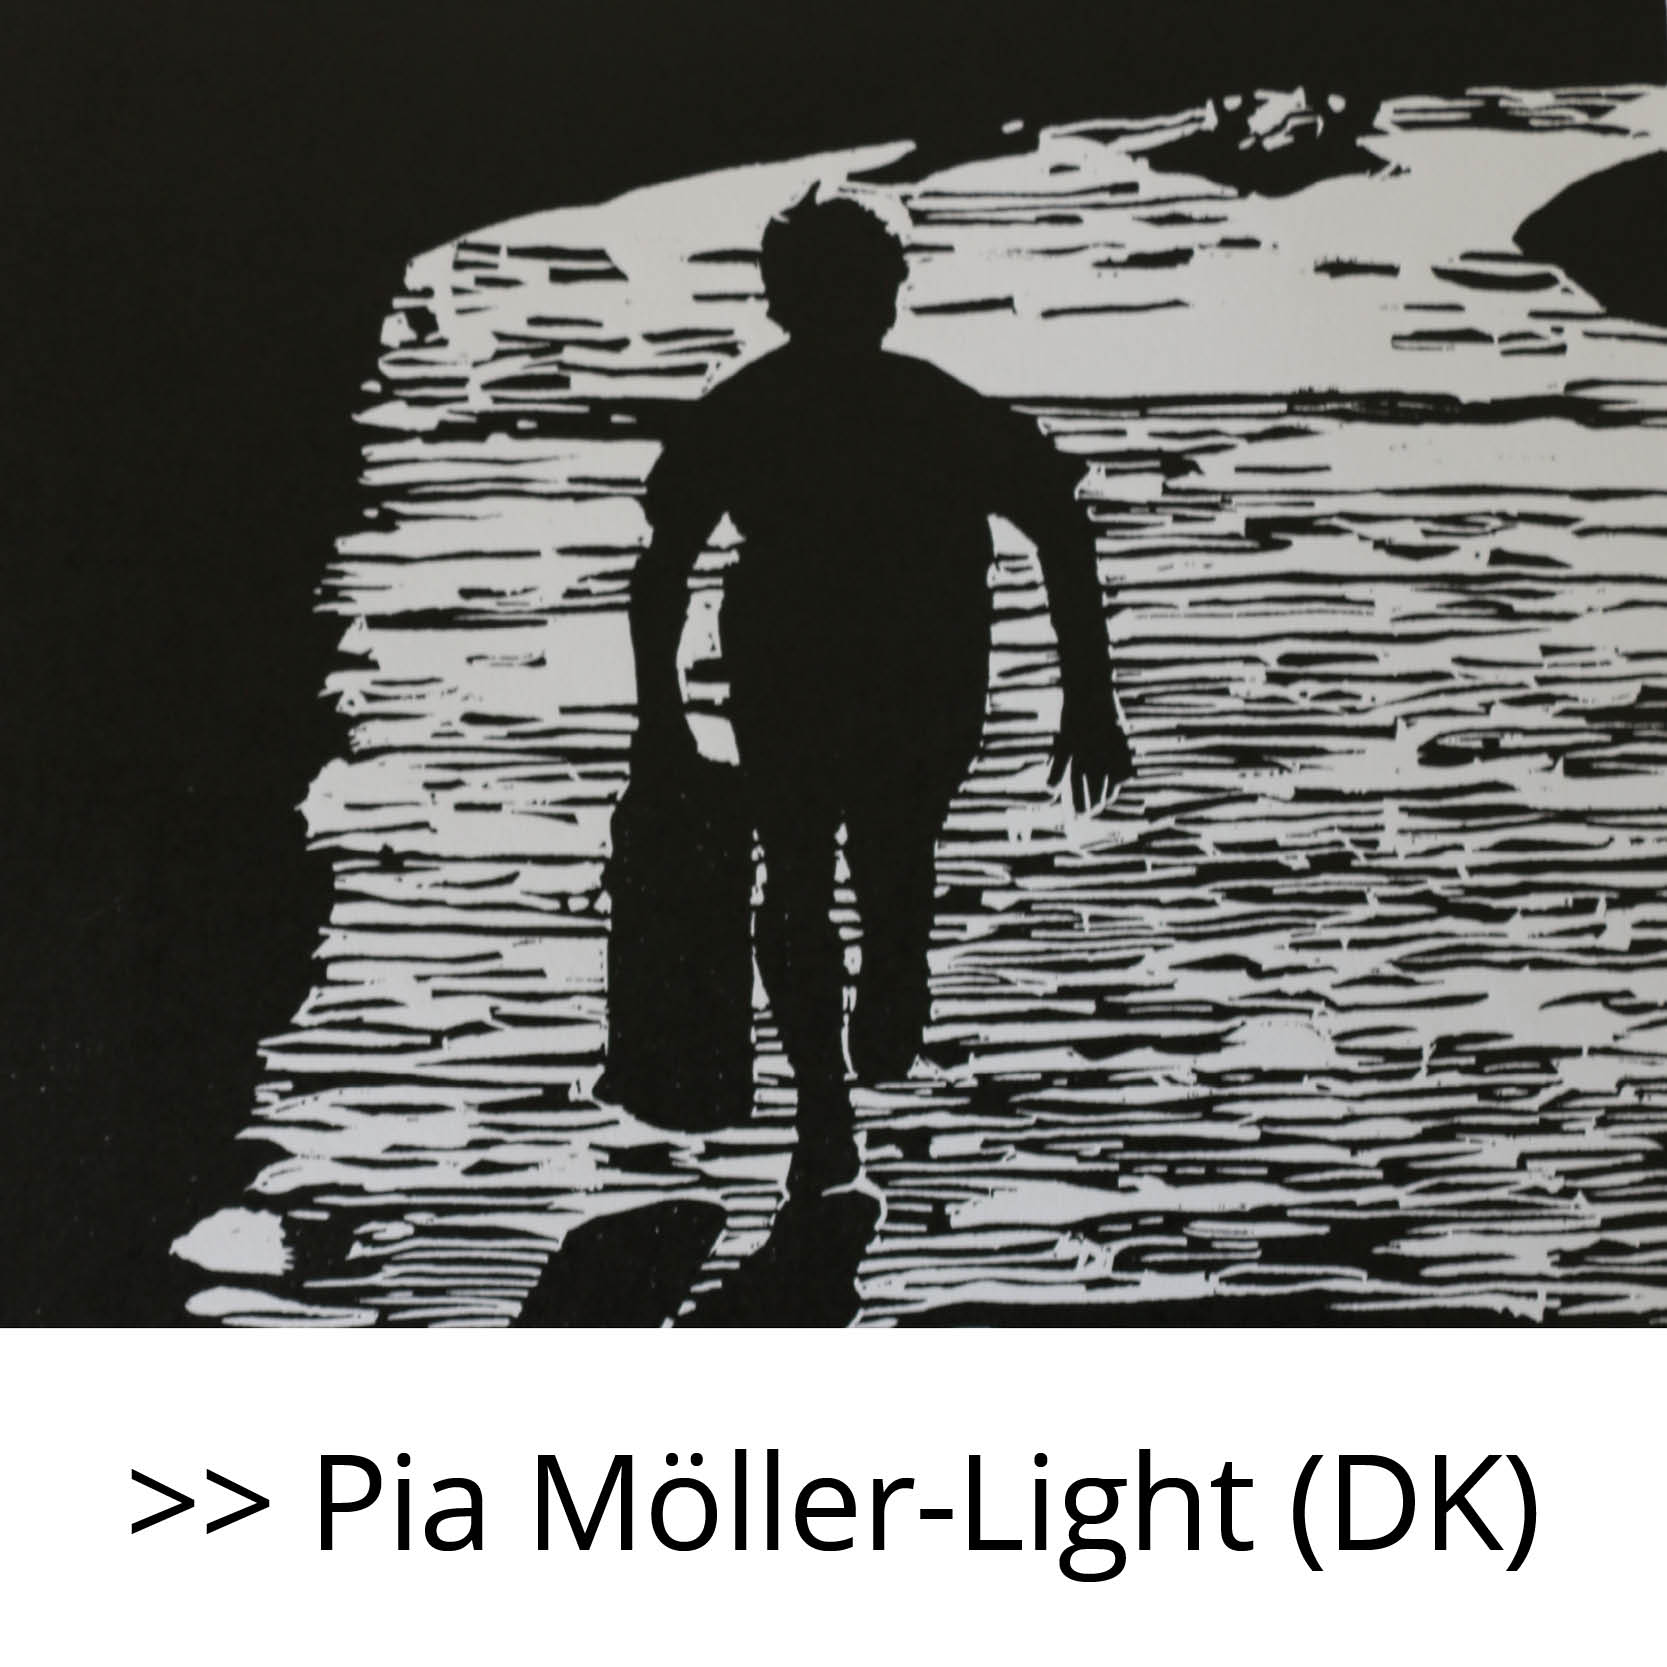 Pia_Möller-Light_(DK)